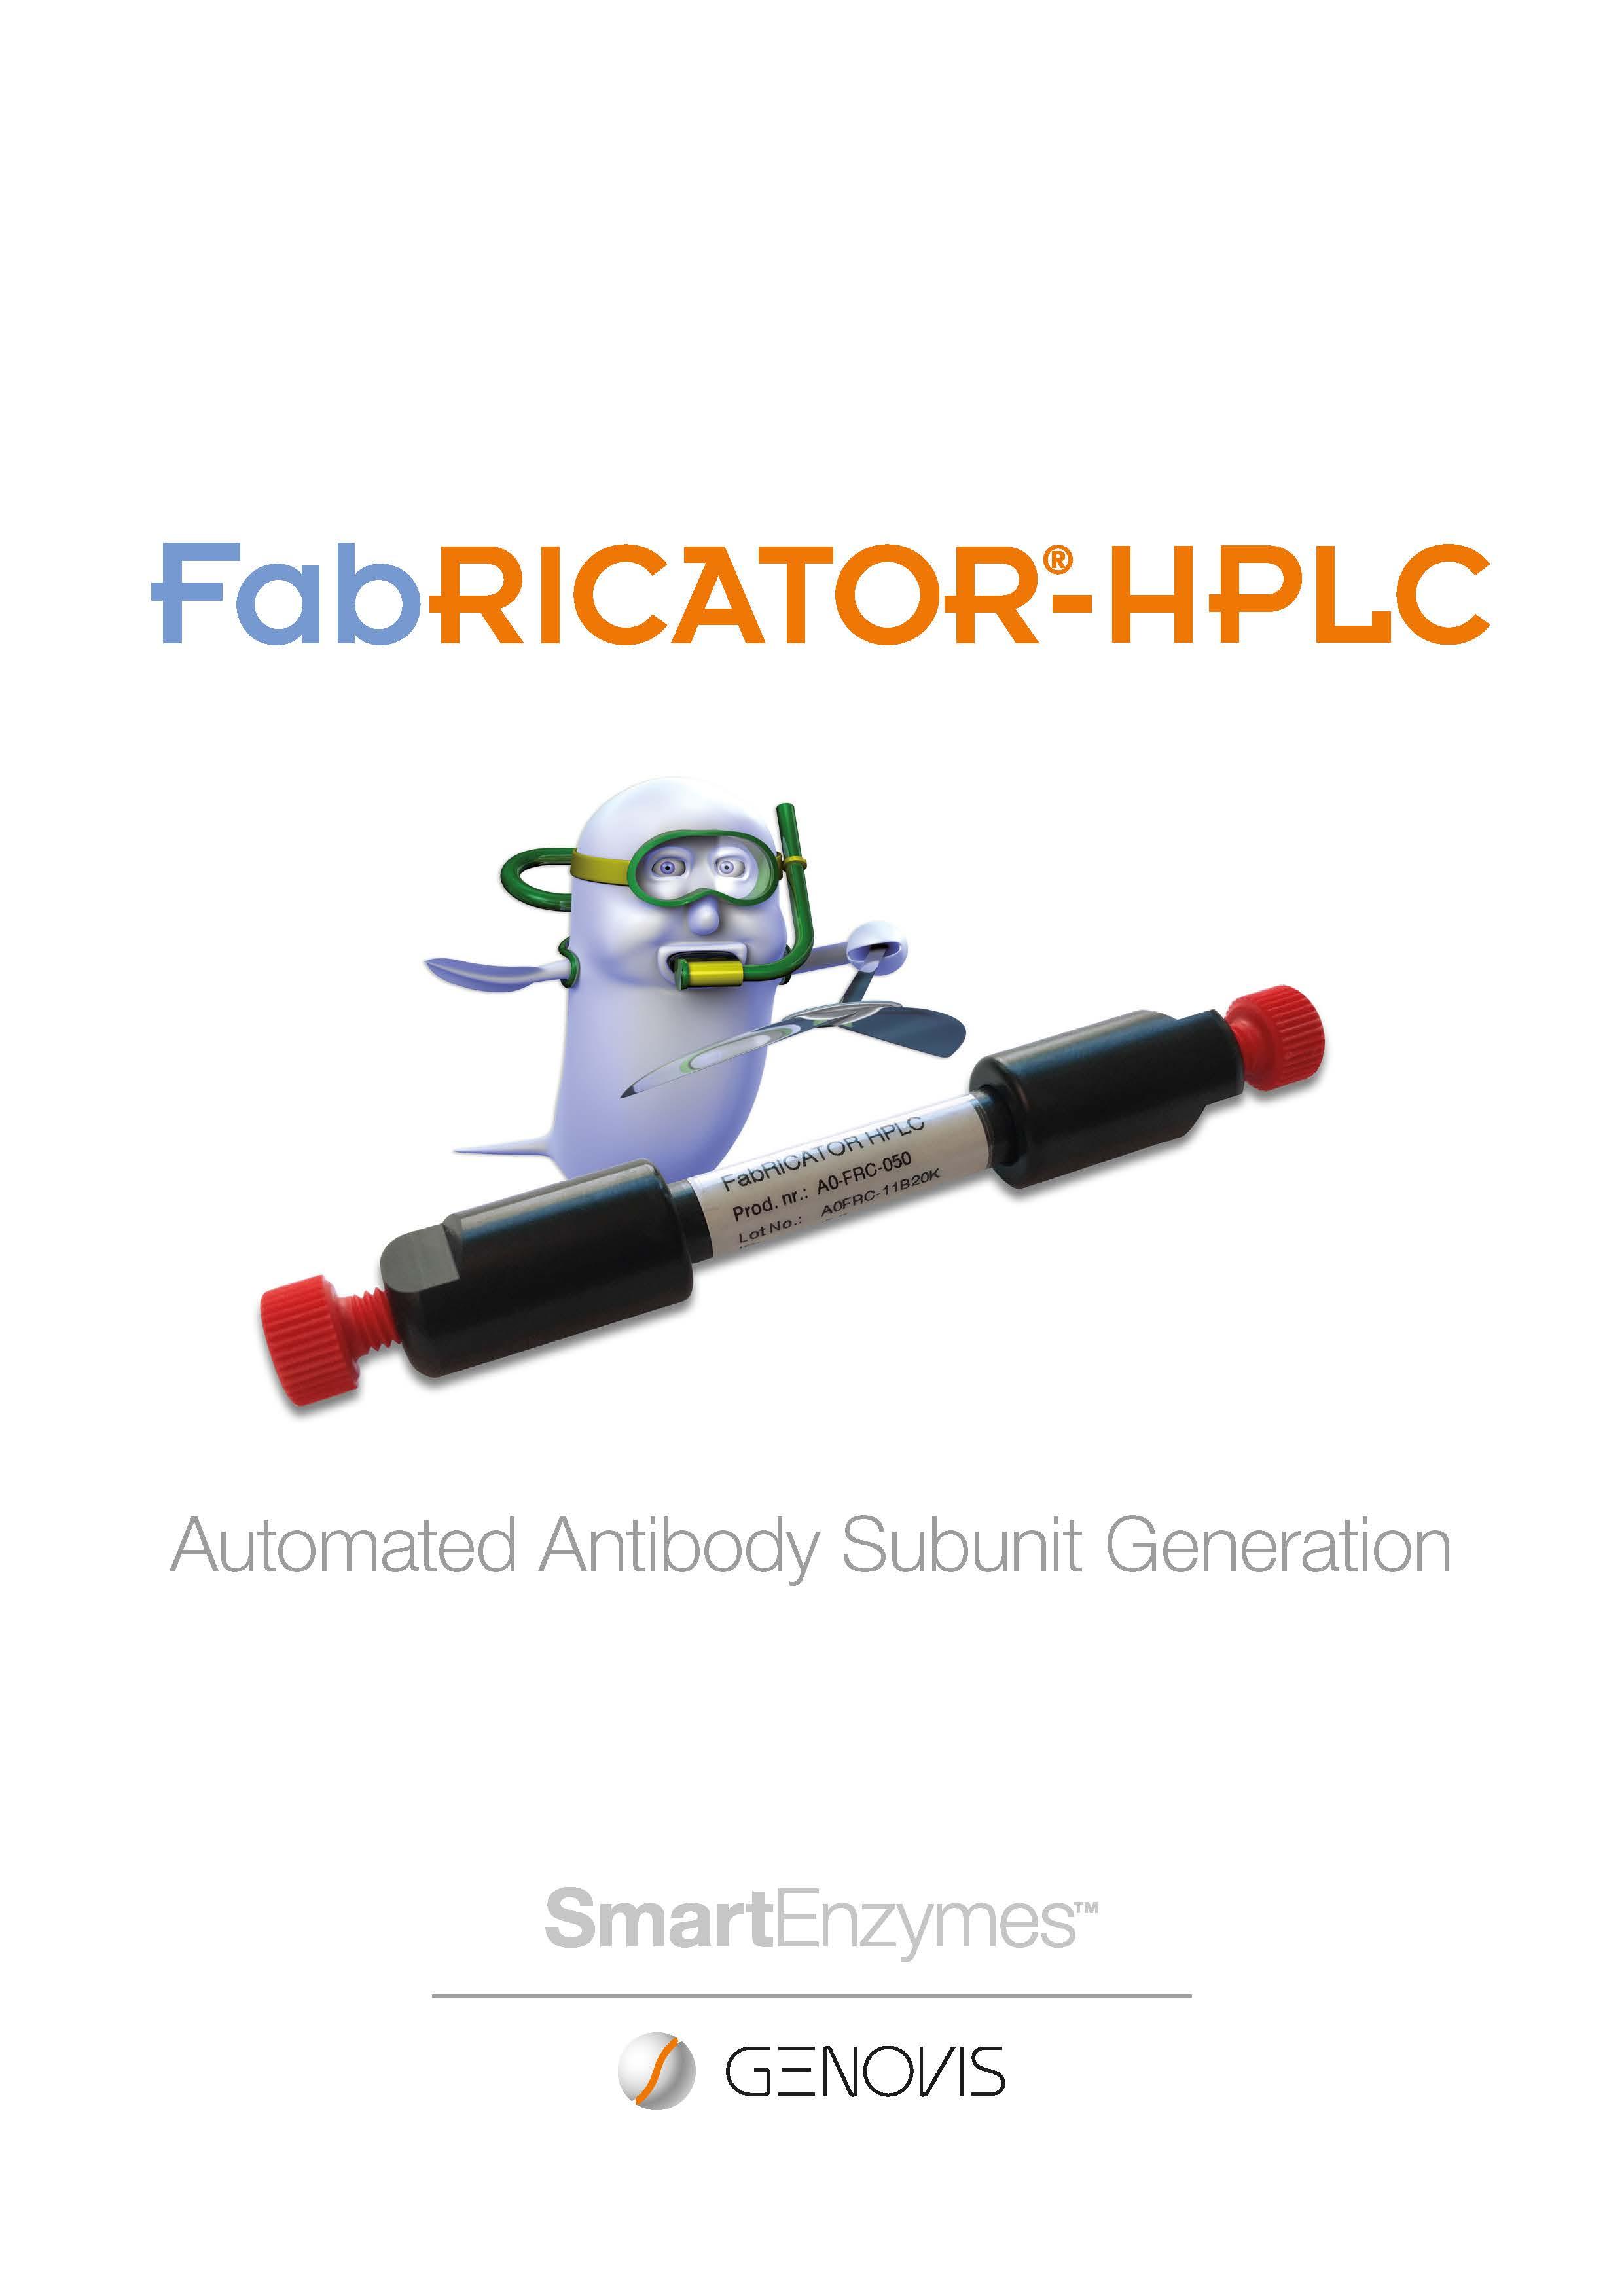 FabRICATOR-HPLC